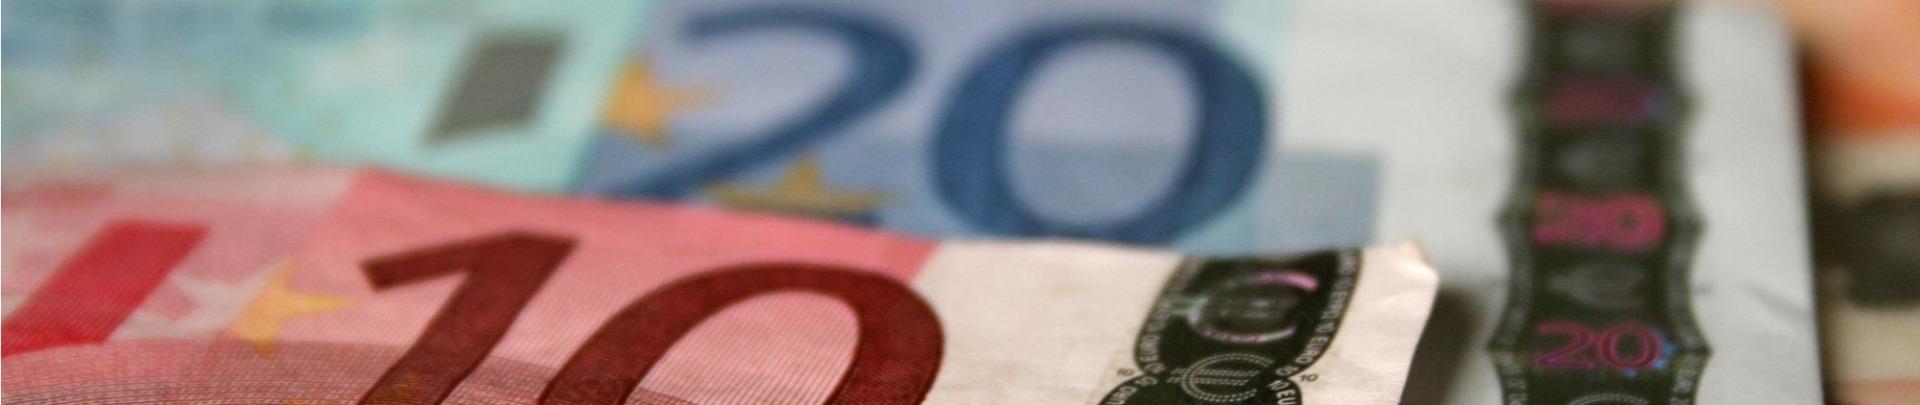 euro biletten tien twintig en vijftig